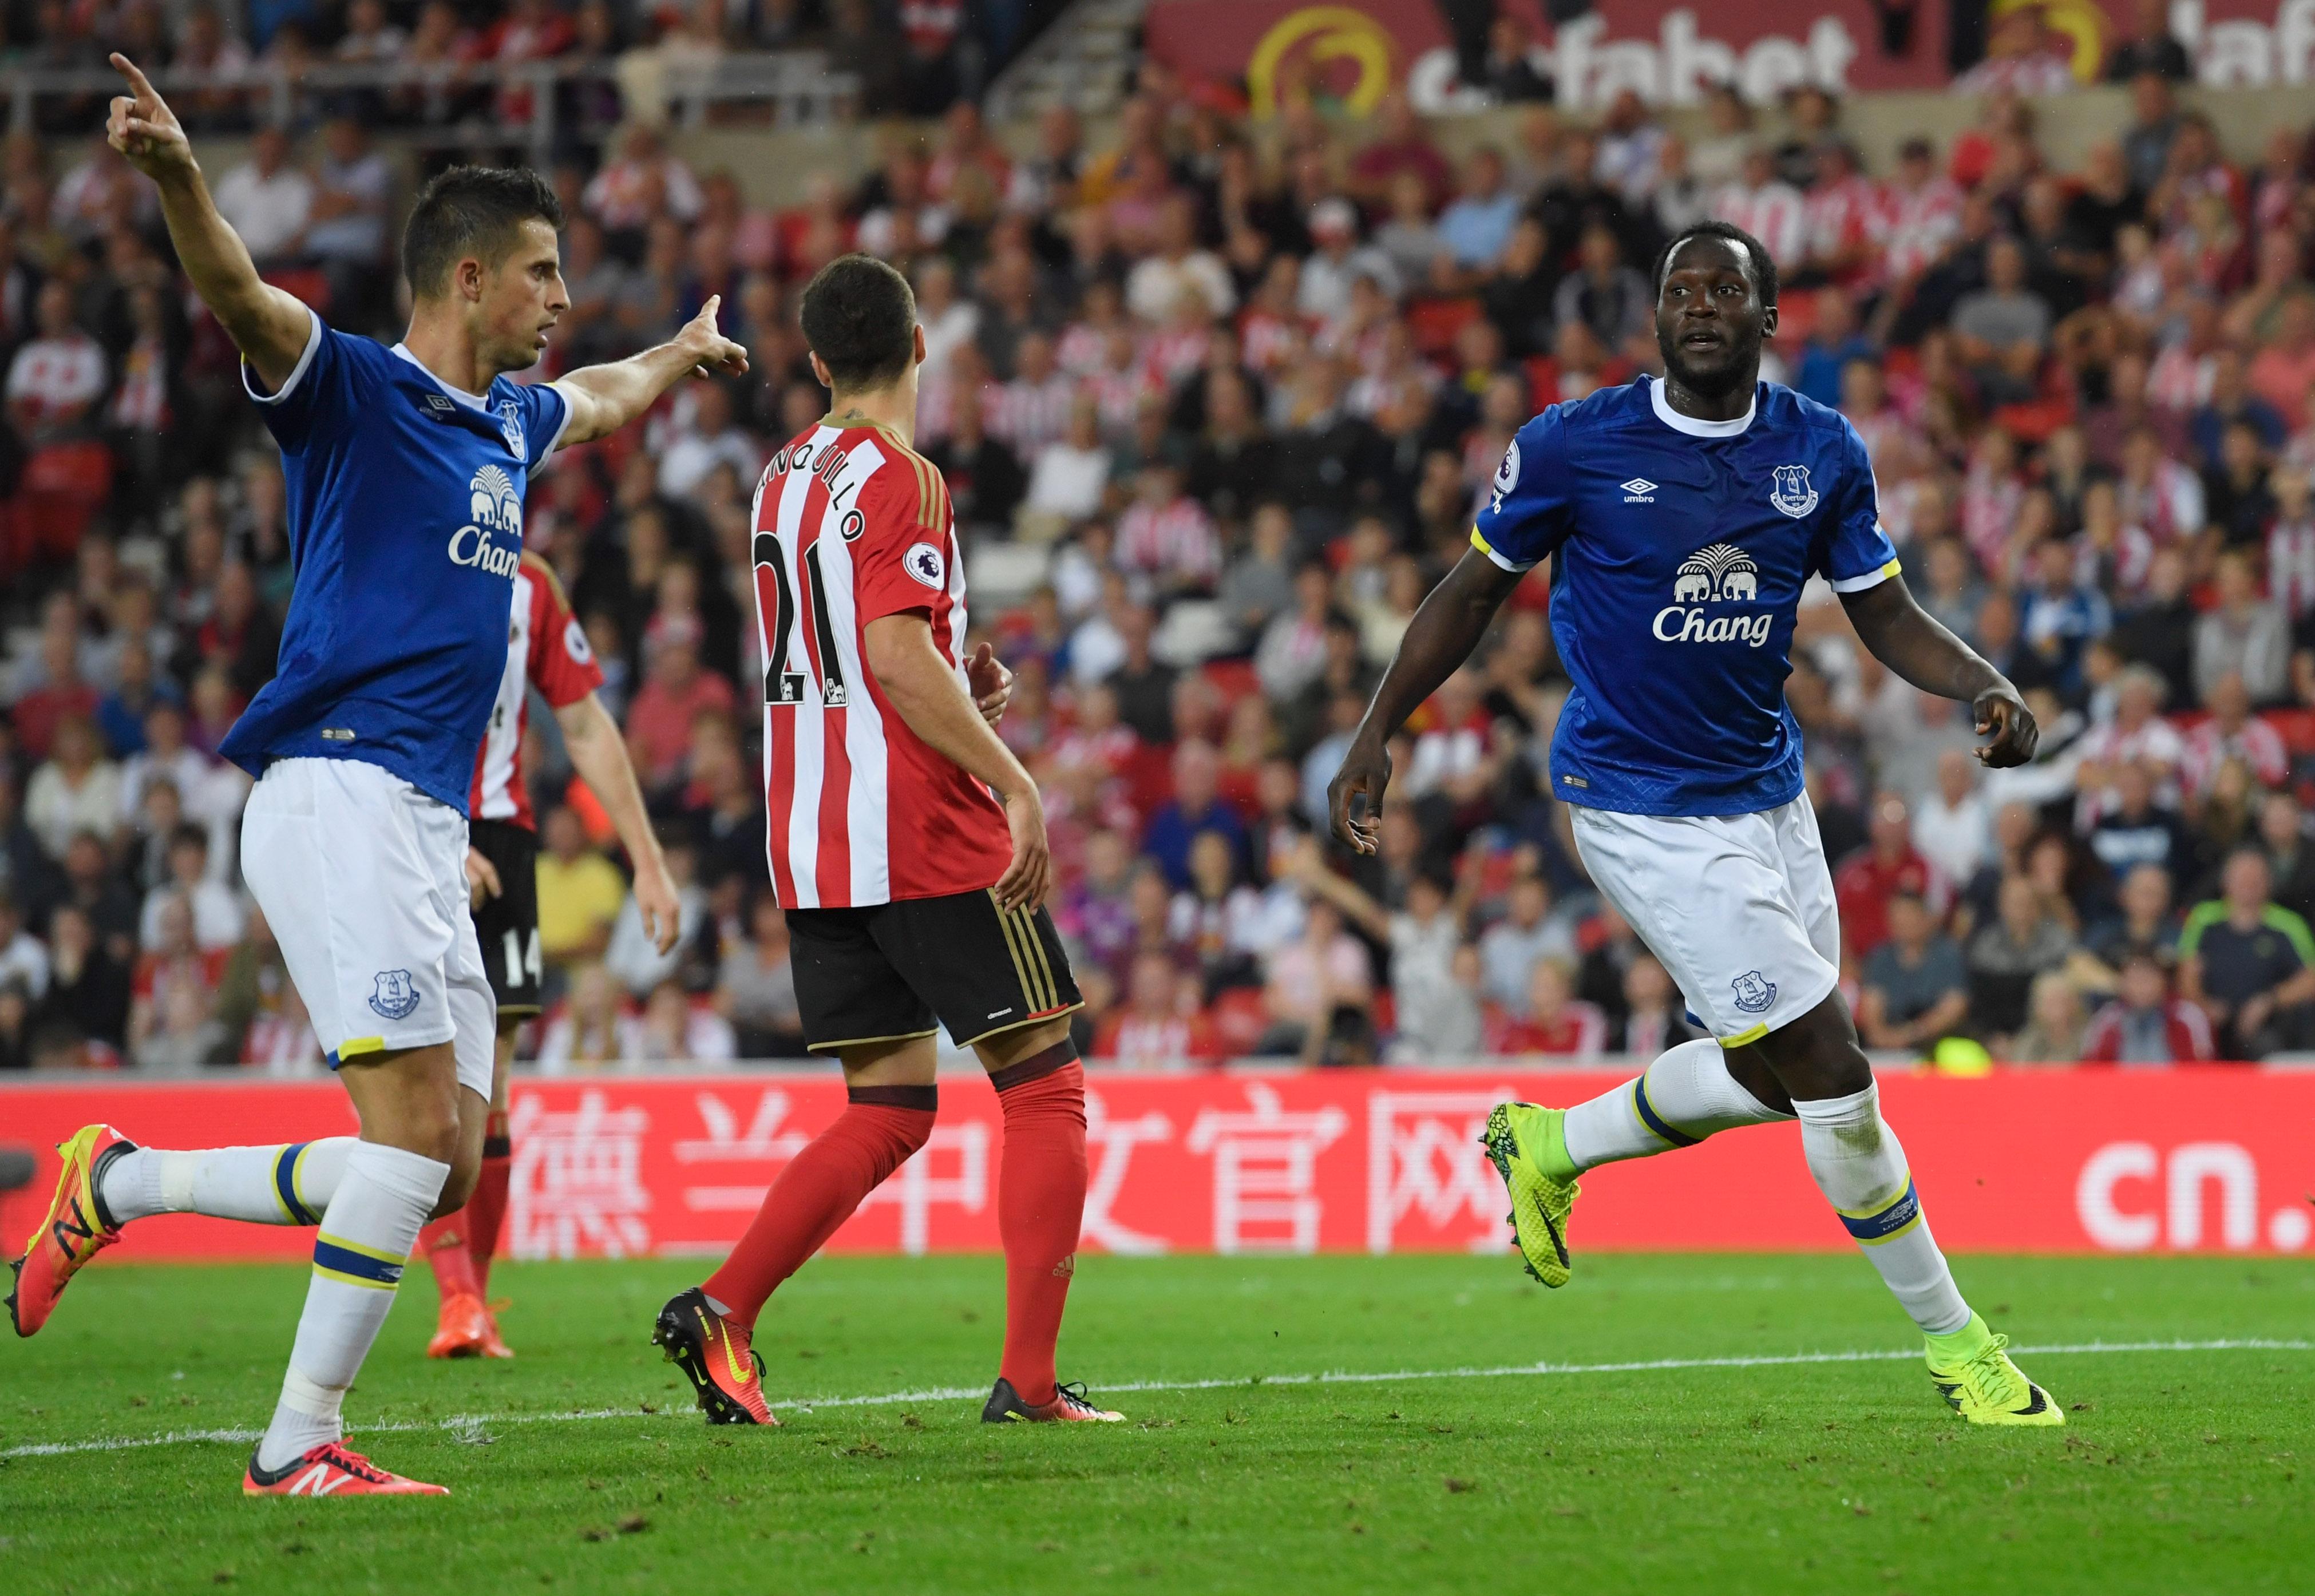 Mirallas and Lukaku celebrate an Everton goal against Sunderland